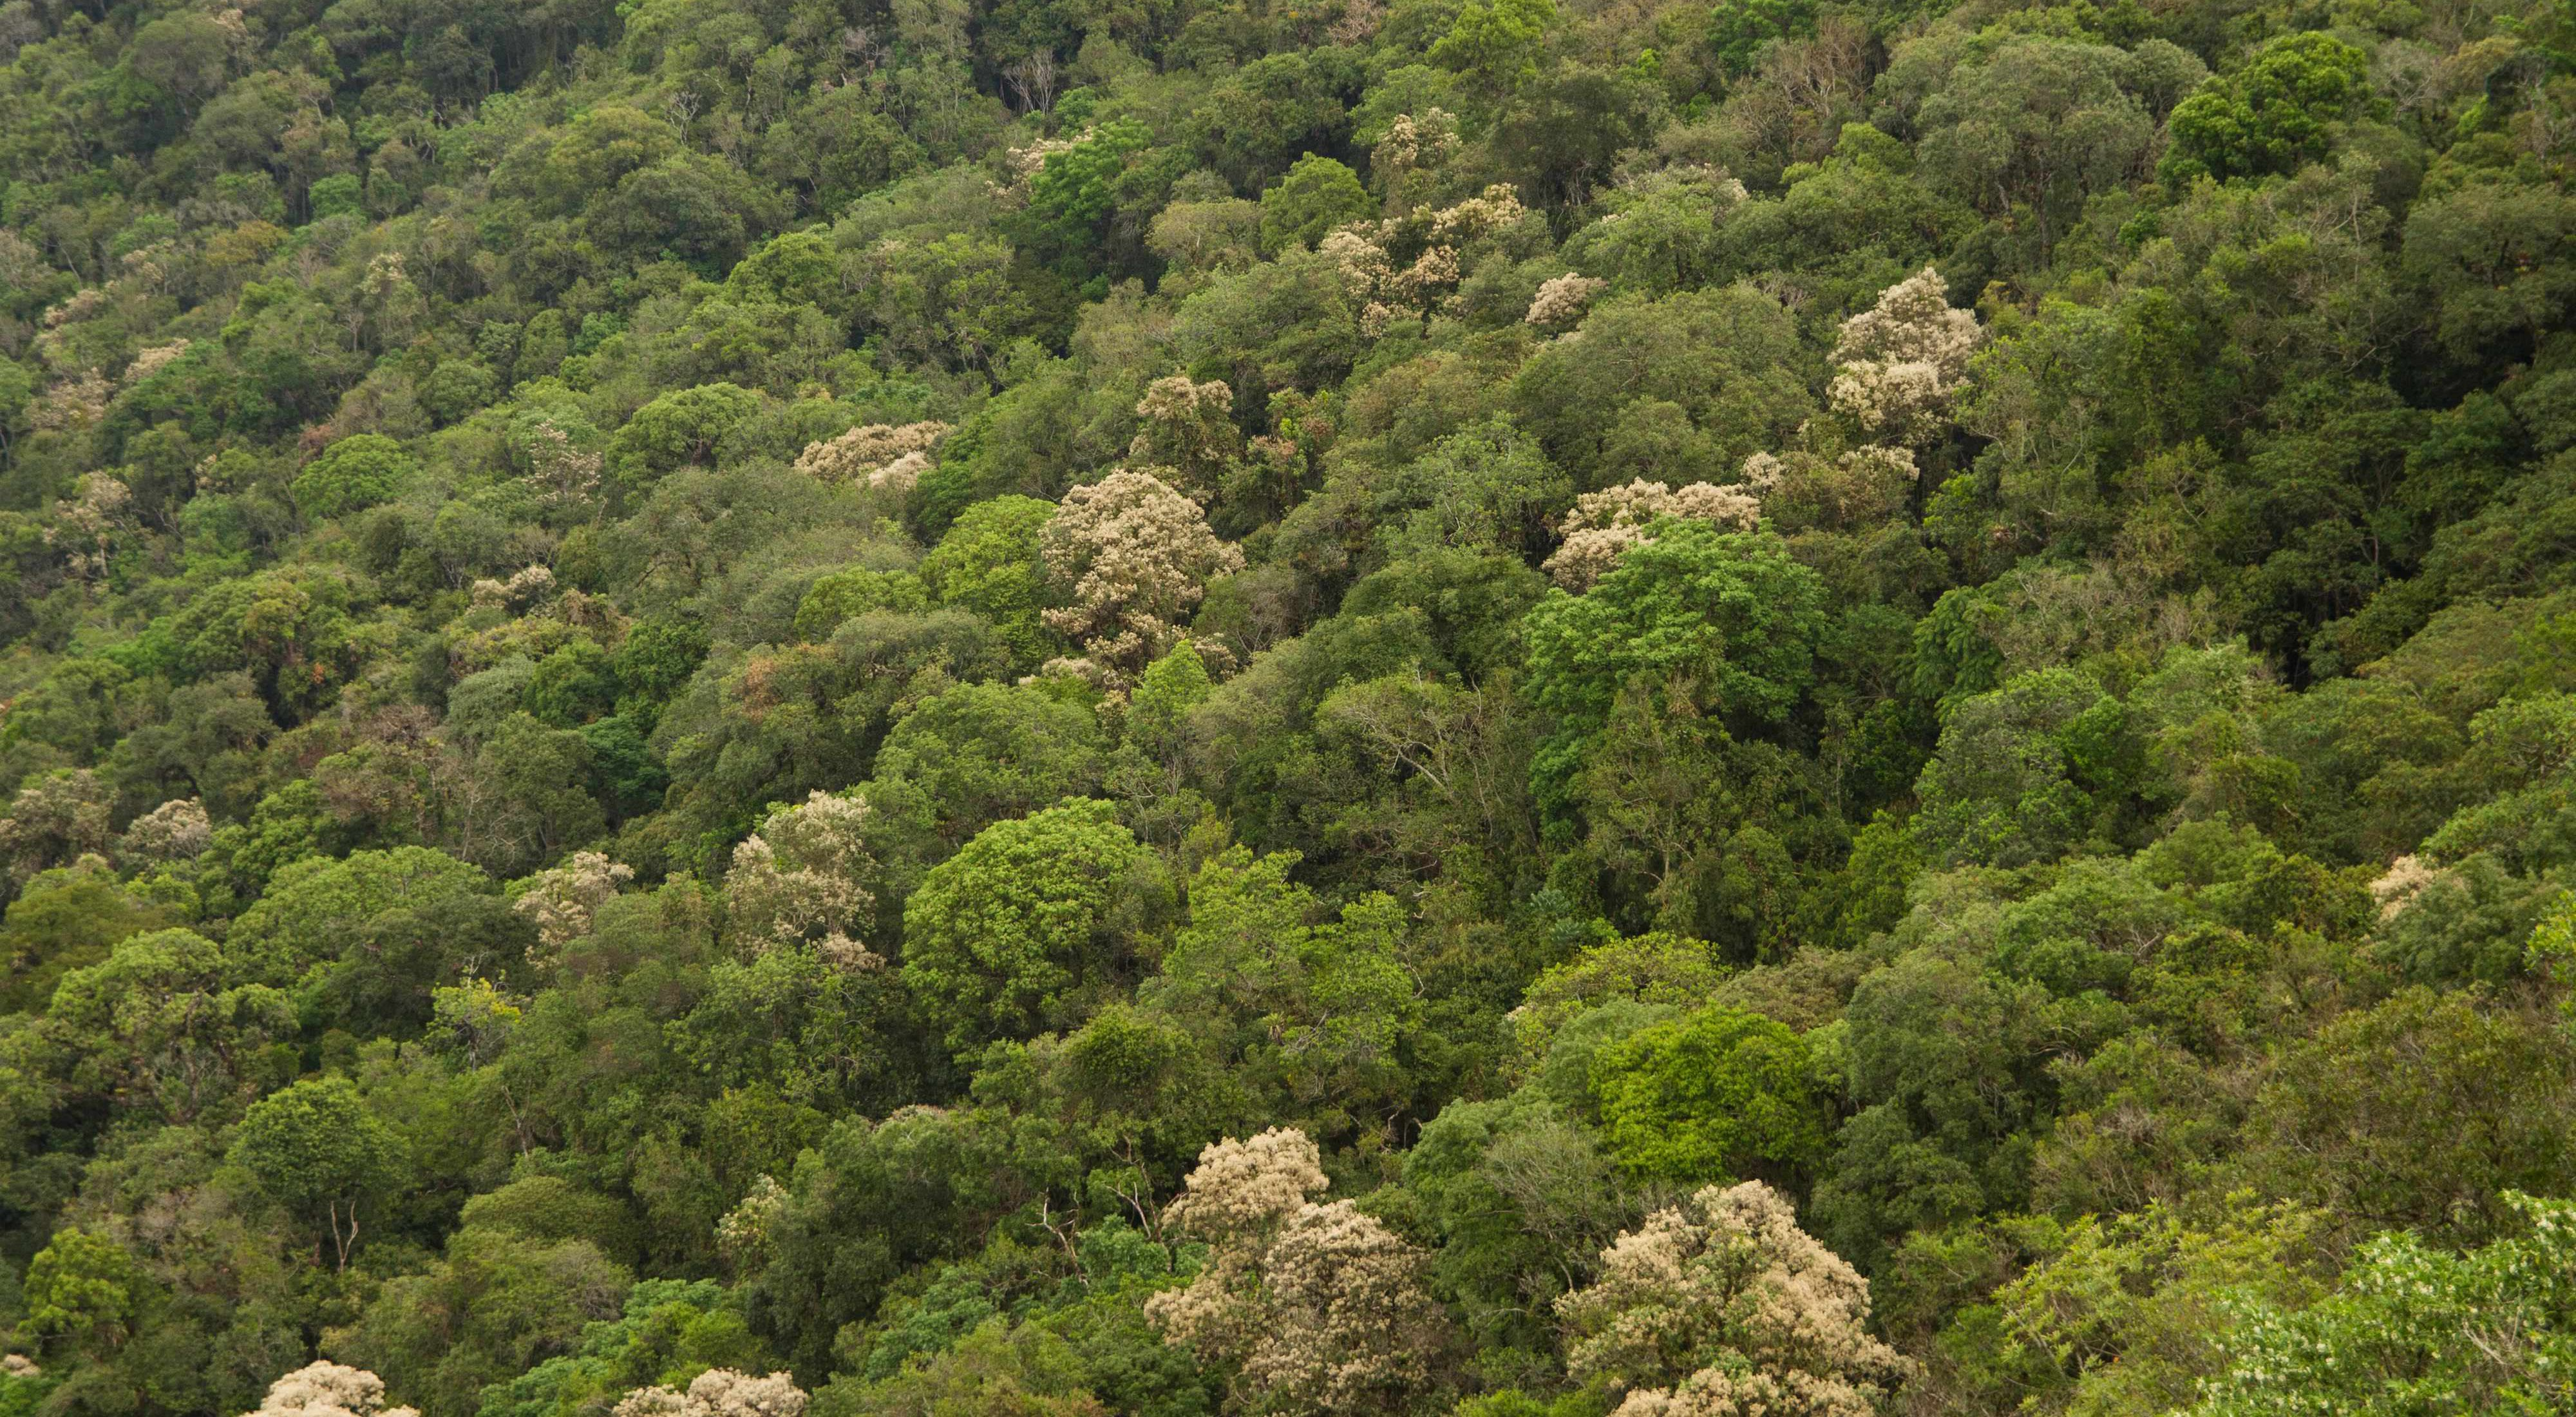 Floresta nativa na Mata Atlântica